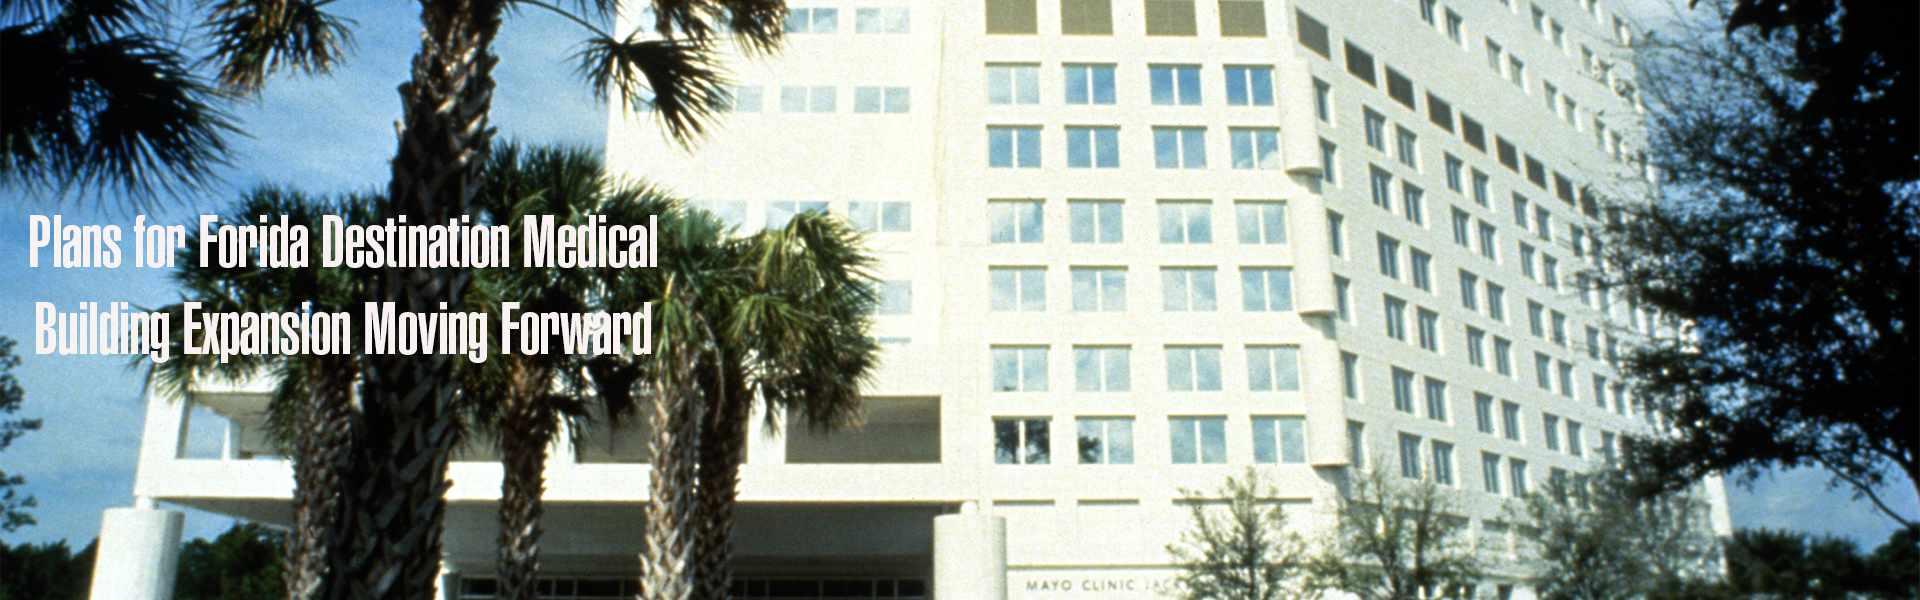 Florida Destination Medical Building Expansion